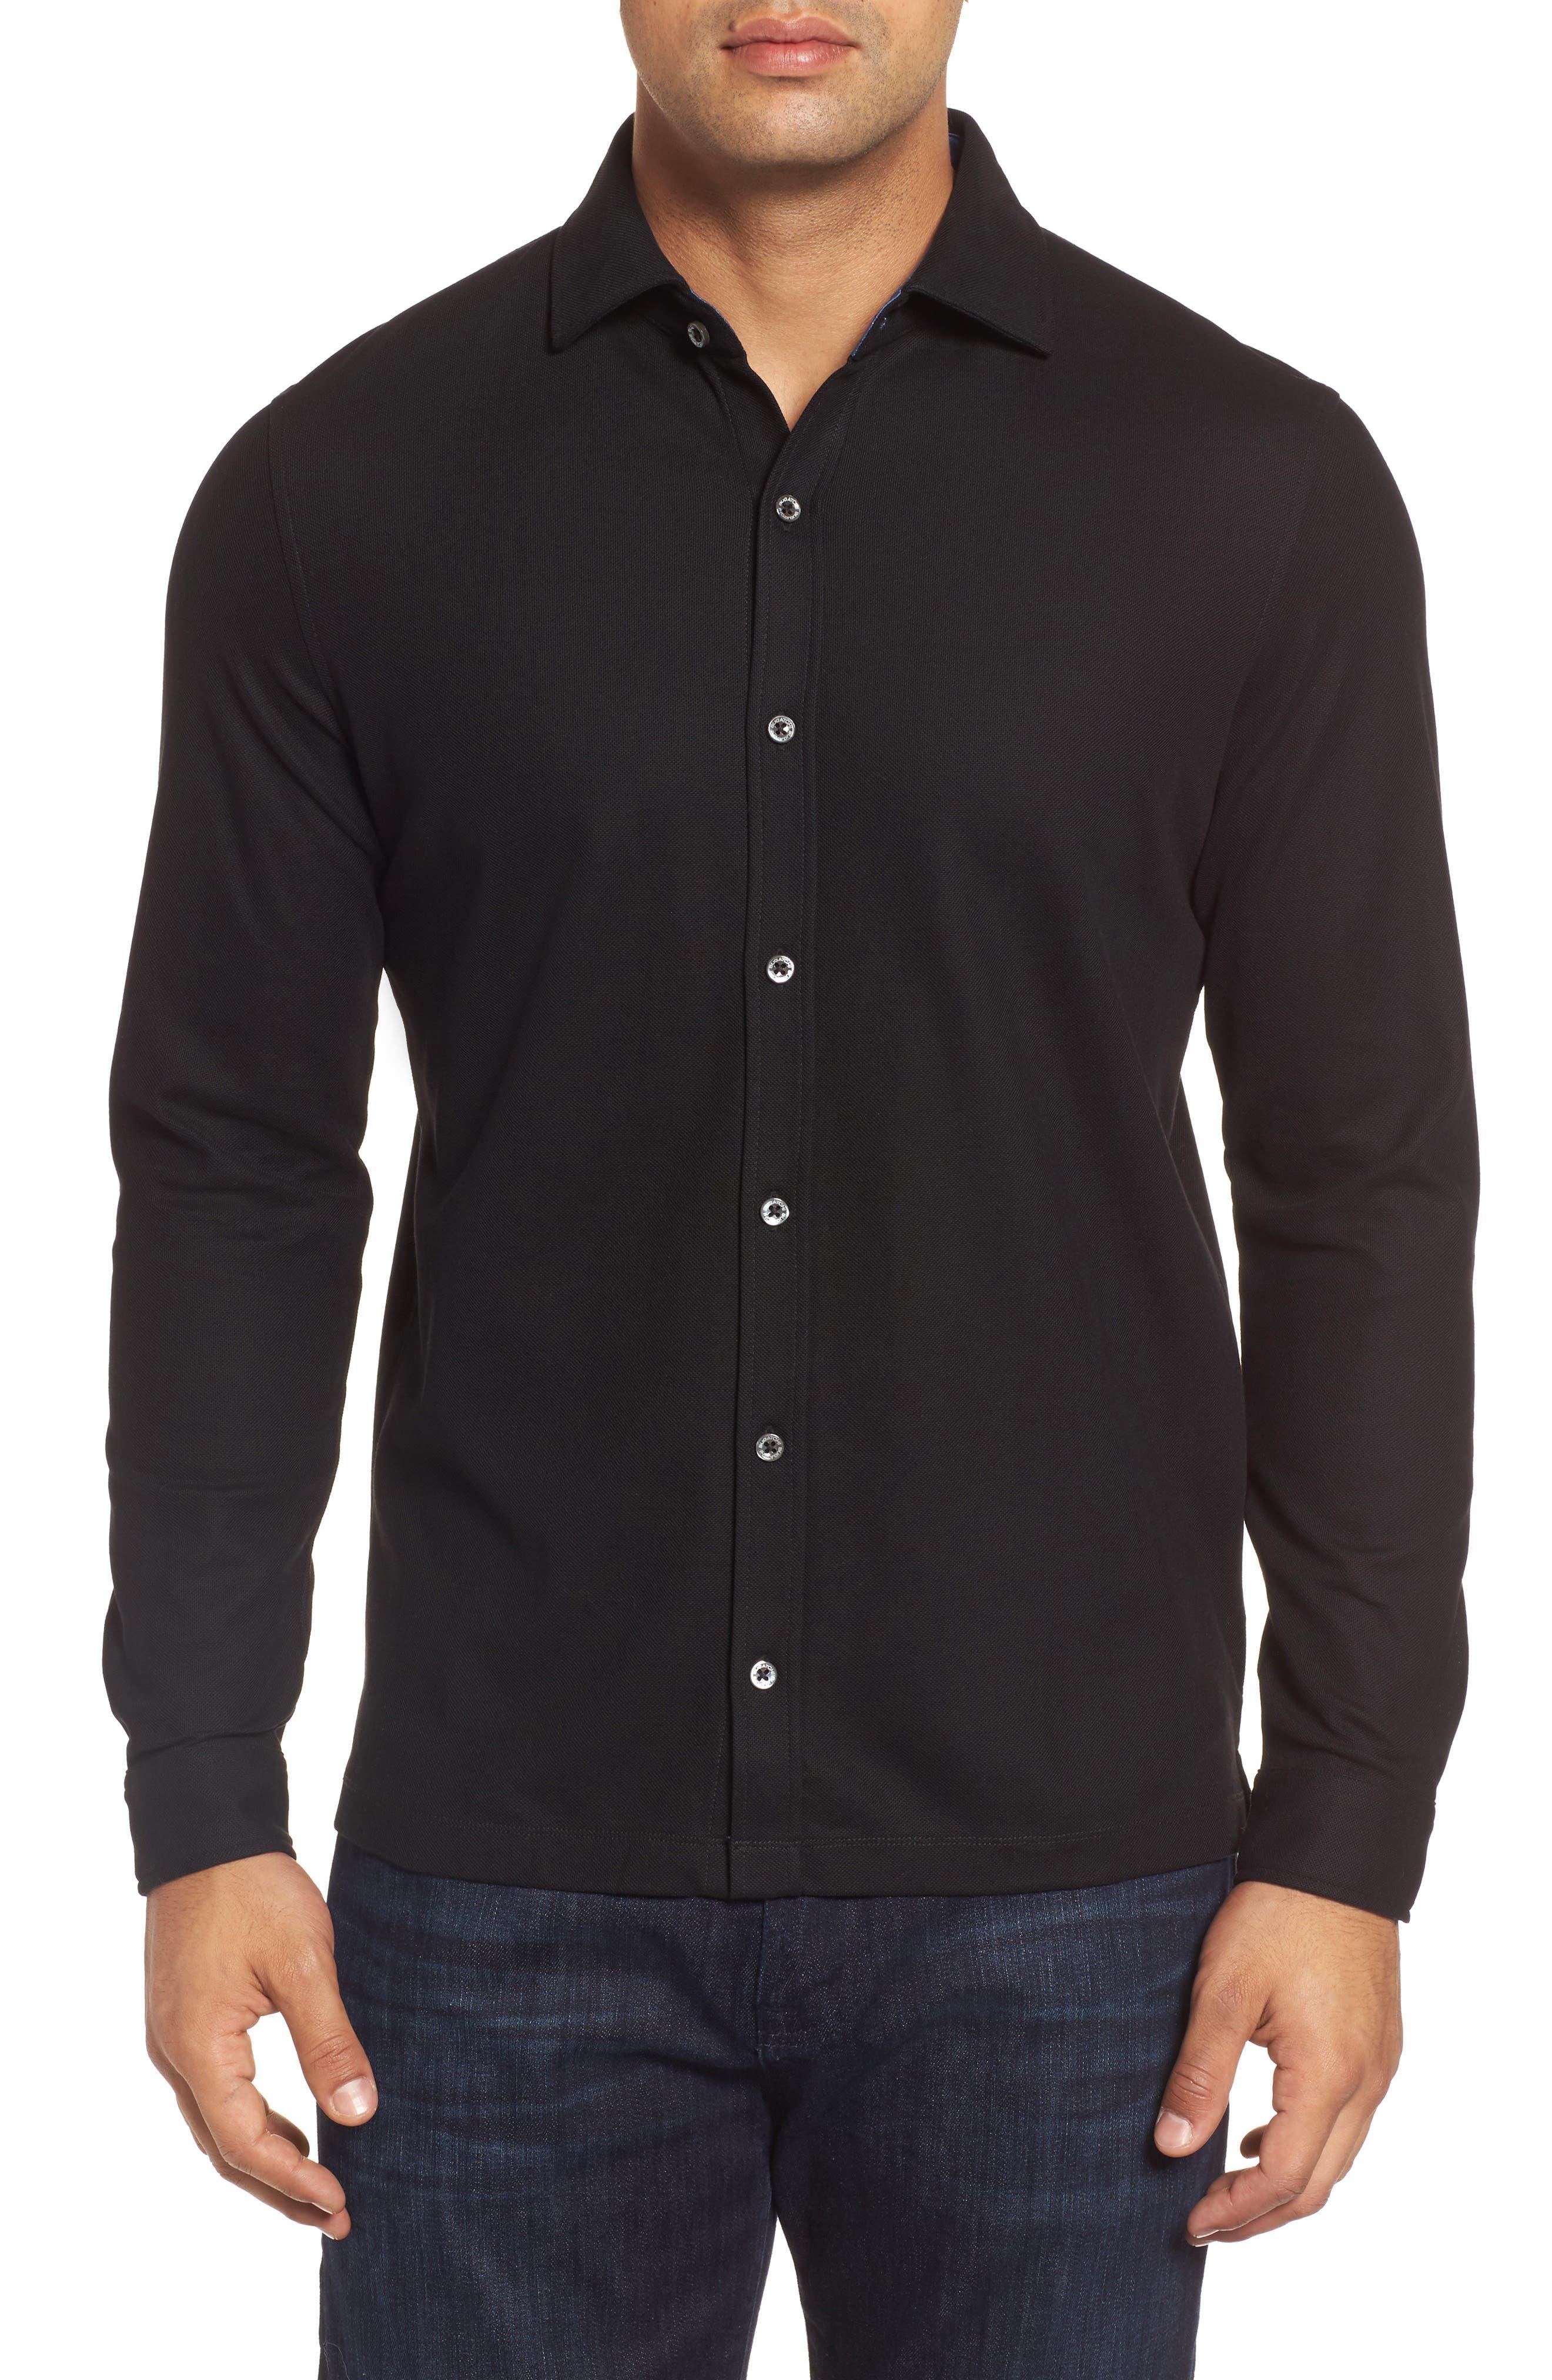 Main Image - Bugatchi Classic Fit Piqué Knit Shirt